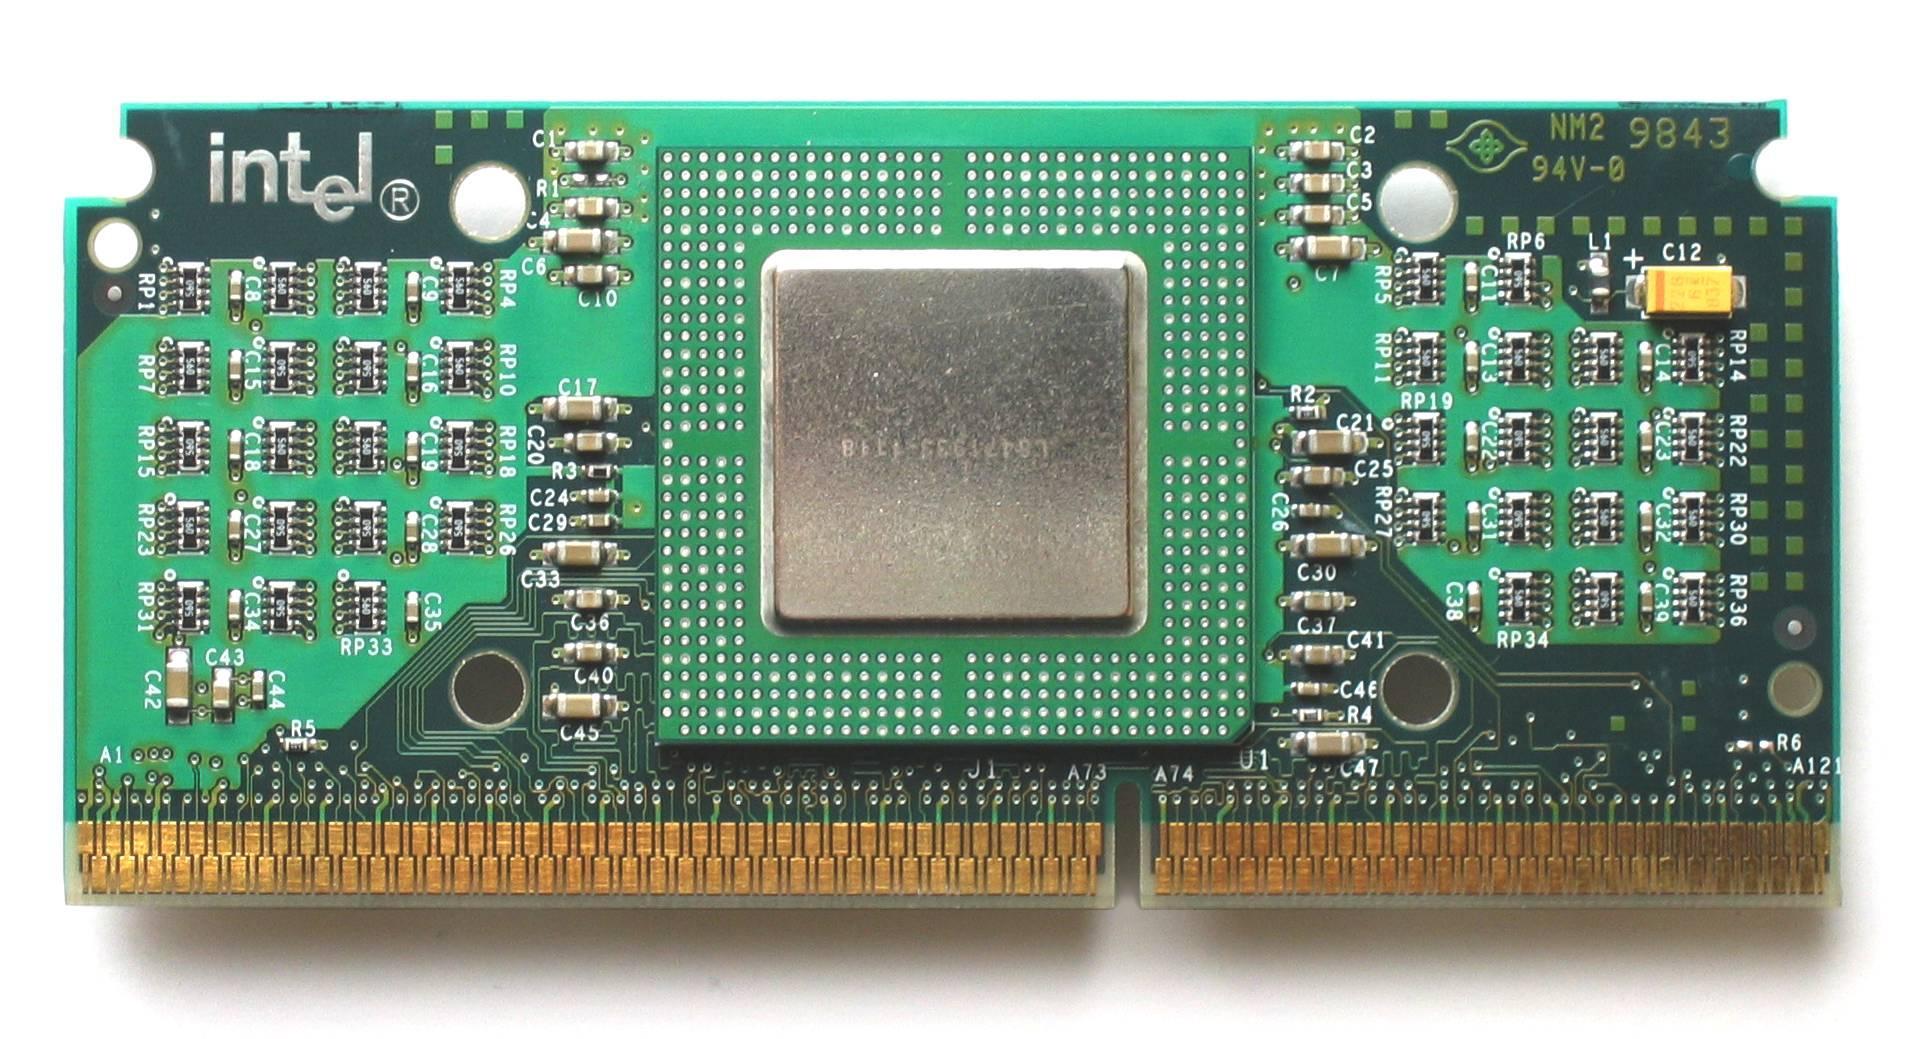 Intel Celeron 300A med Slot 1-sokkel.Foto: Qurren, Wikimedia Commons